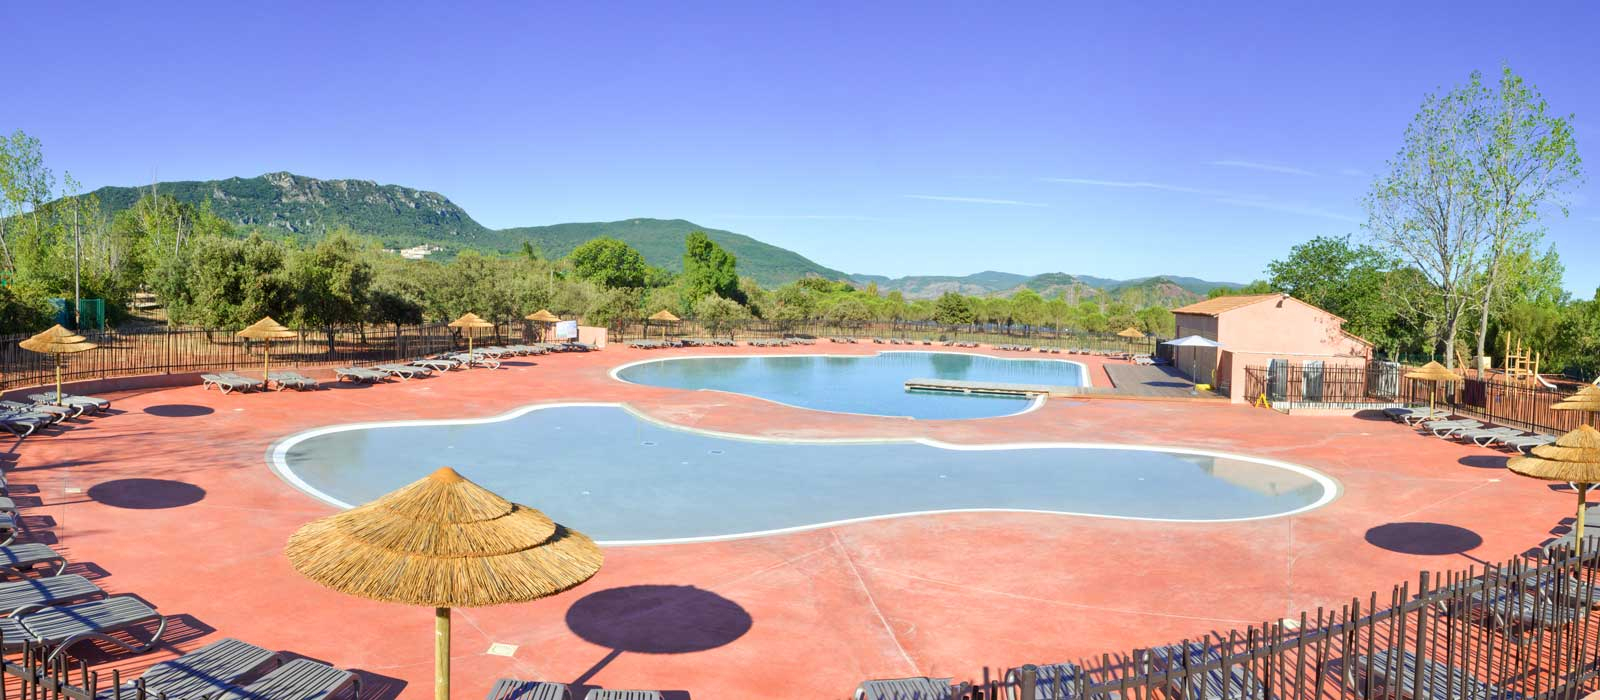 Camping Lake Salagou - Campsite Clermont L'hérault 4 Stars Pool tout Piscine Clermont L Hérault